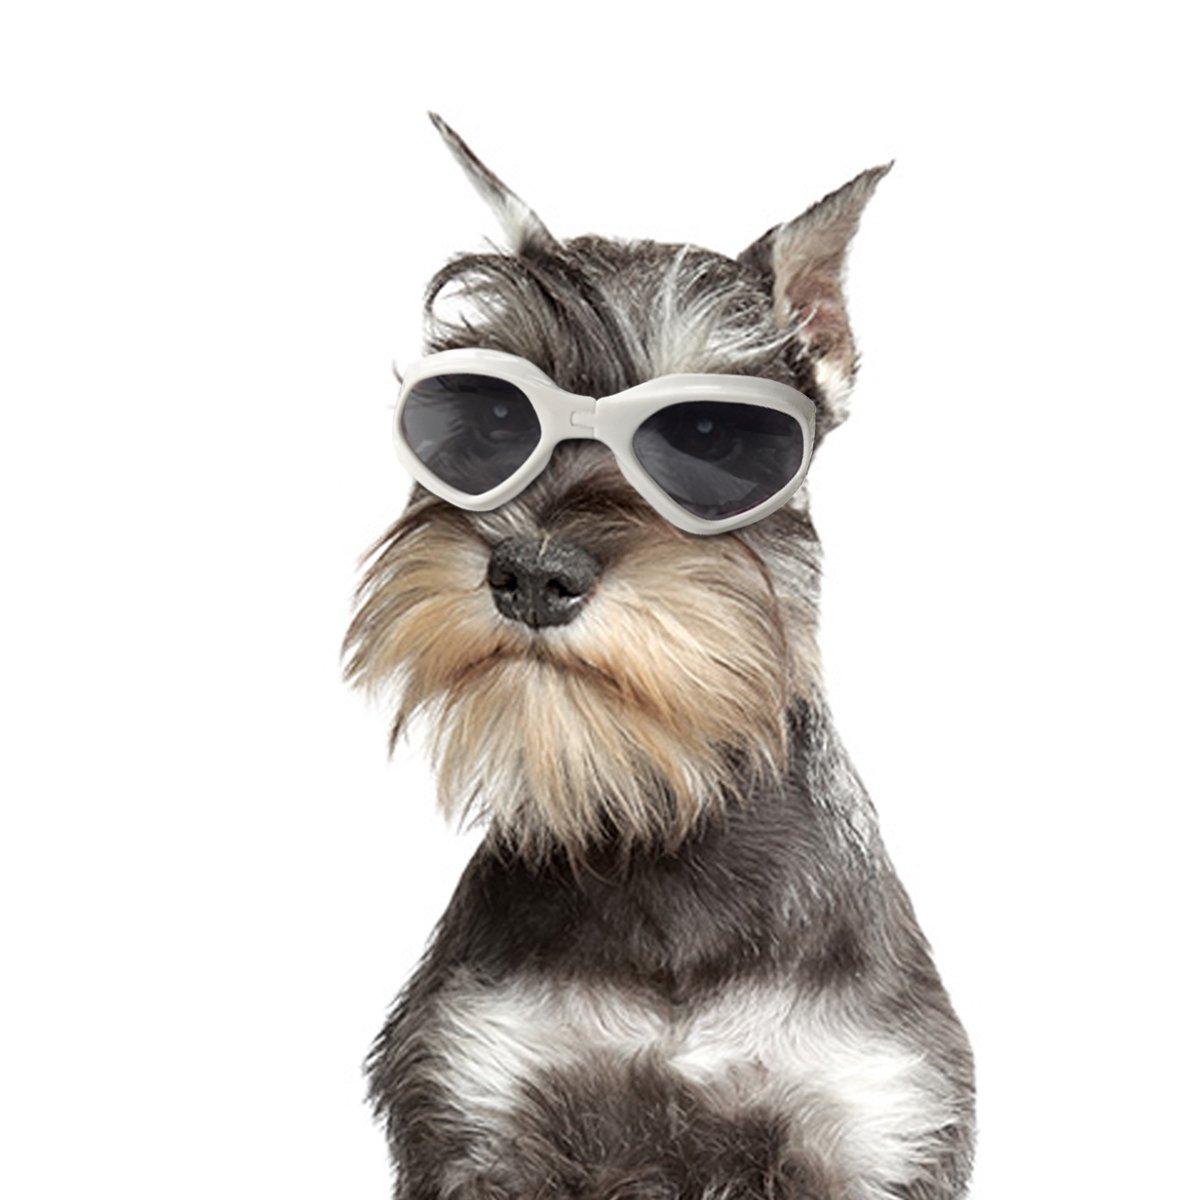 Petleso Pet Goggles, Stylish Dog Sunglasses for UV Stop Waterproof Windproof Anti-fog Eye Protection - White